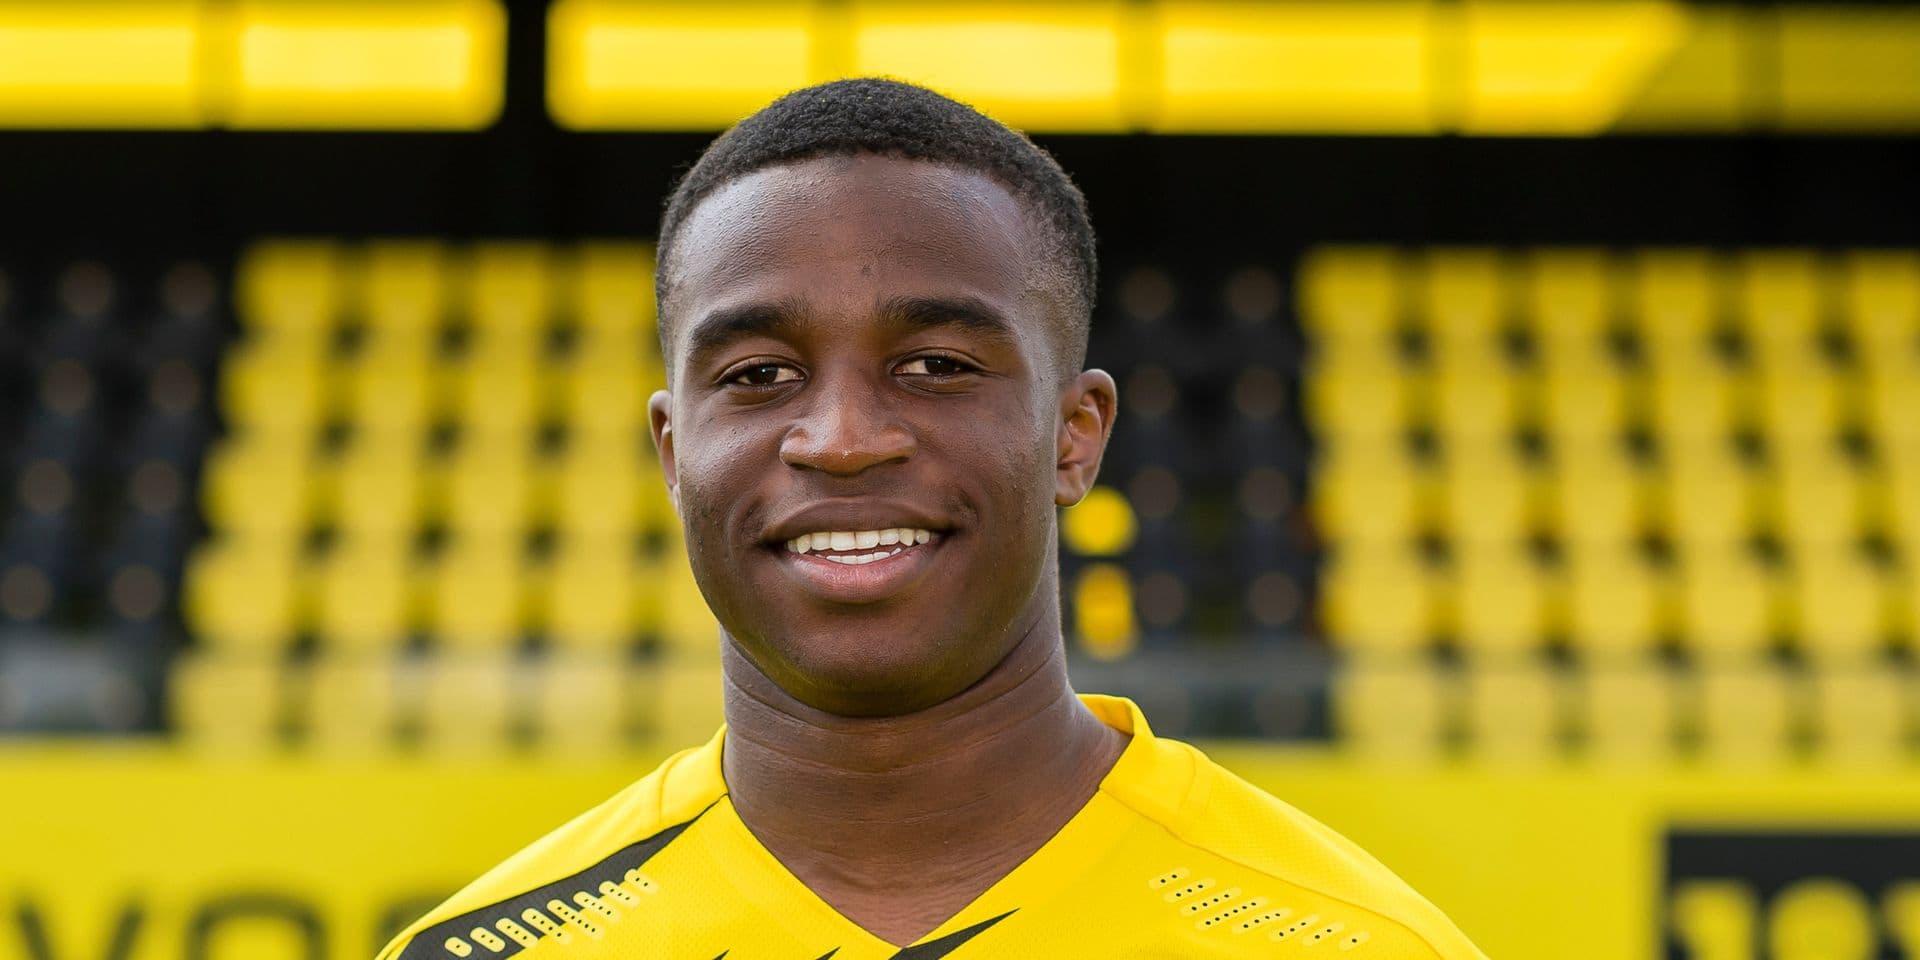 Dortmund veut inscrire Moukoko, son prodige qui aura 16 ans en novembre, en C1